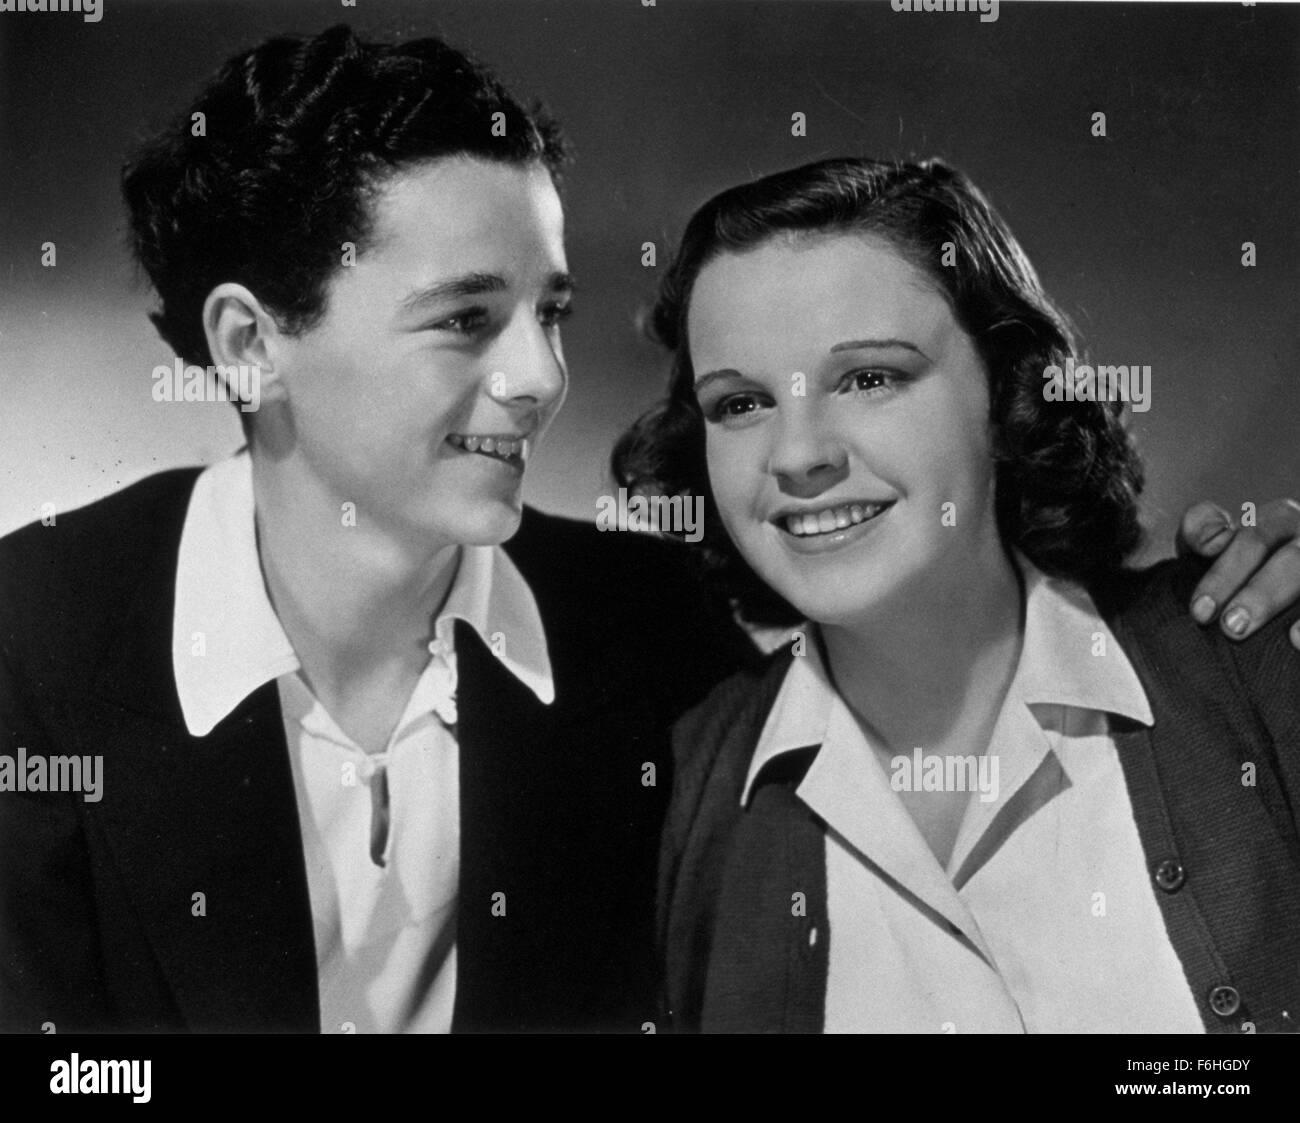 1938, Film Title: LISTEN, DARLING, Director: EDWIN L MARIN, Studio: MGM, Pictured: FREDDIE BARTHOLOMEW, JUDY GARLAND. - Stock Image